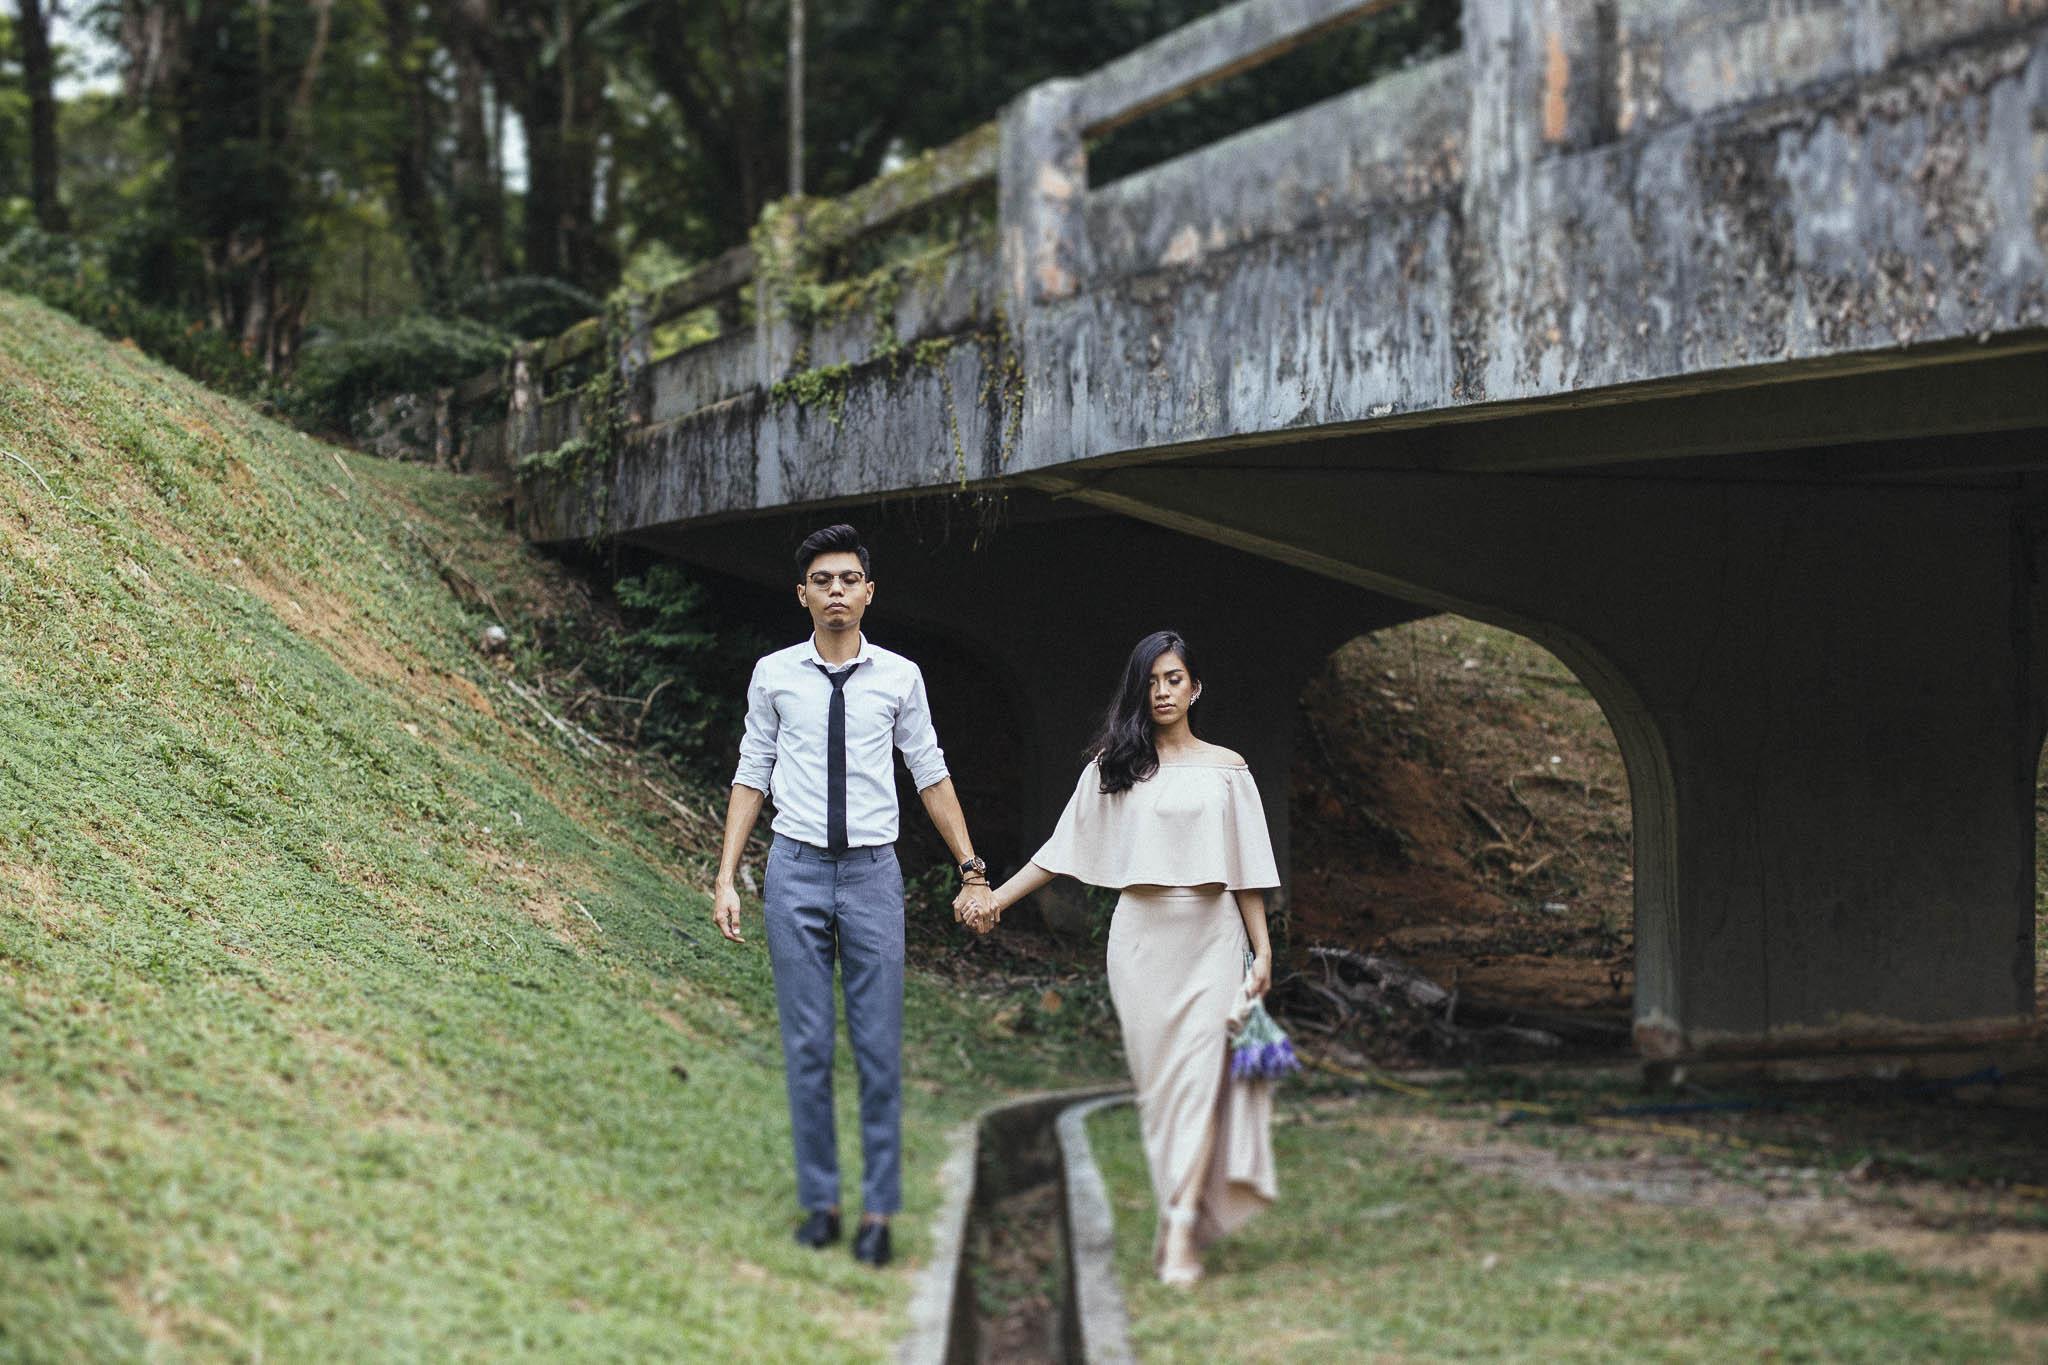 singapore-wedding-photographer-malay-travel-adli-tashah-05.jpg